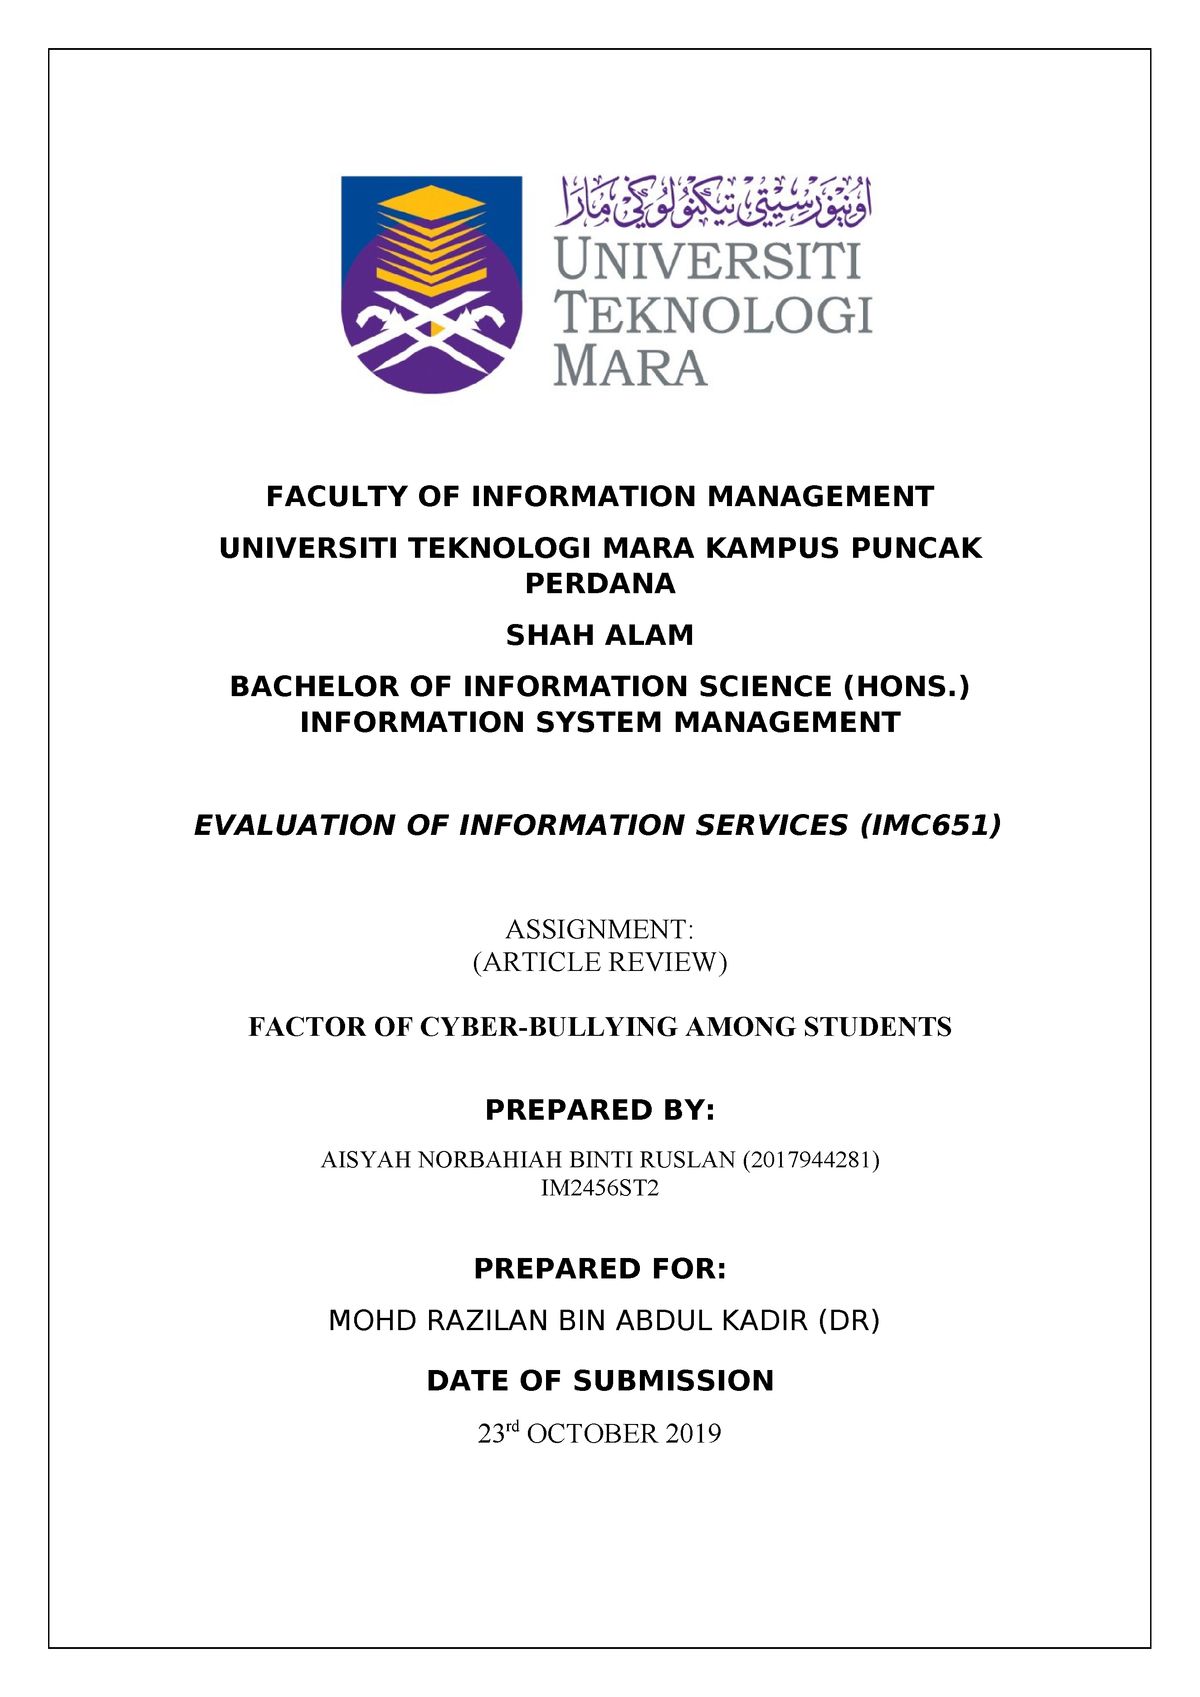 Report Article Review Imc651 Individual Faculty Of Information Management Universiti Teknologi Mara Kampus Puncak Perdana Shah Alam Bachelor Of Information Studocu